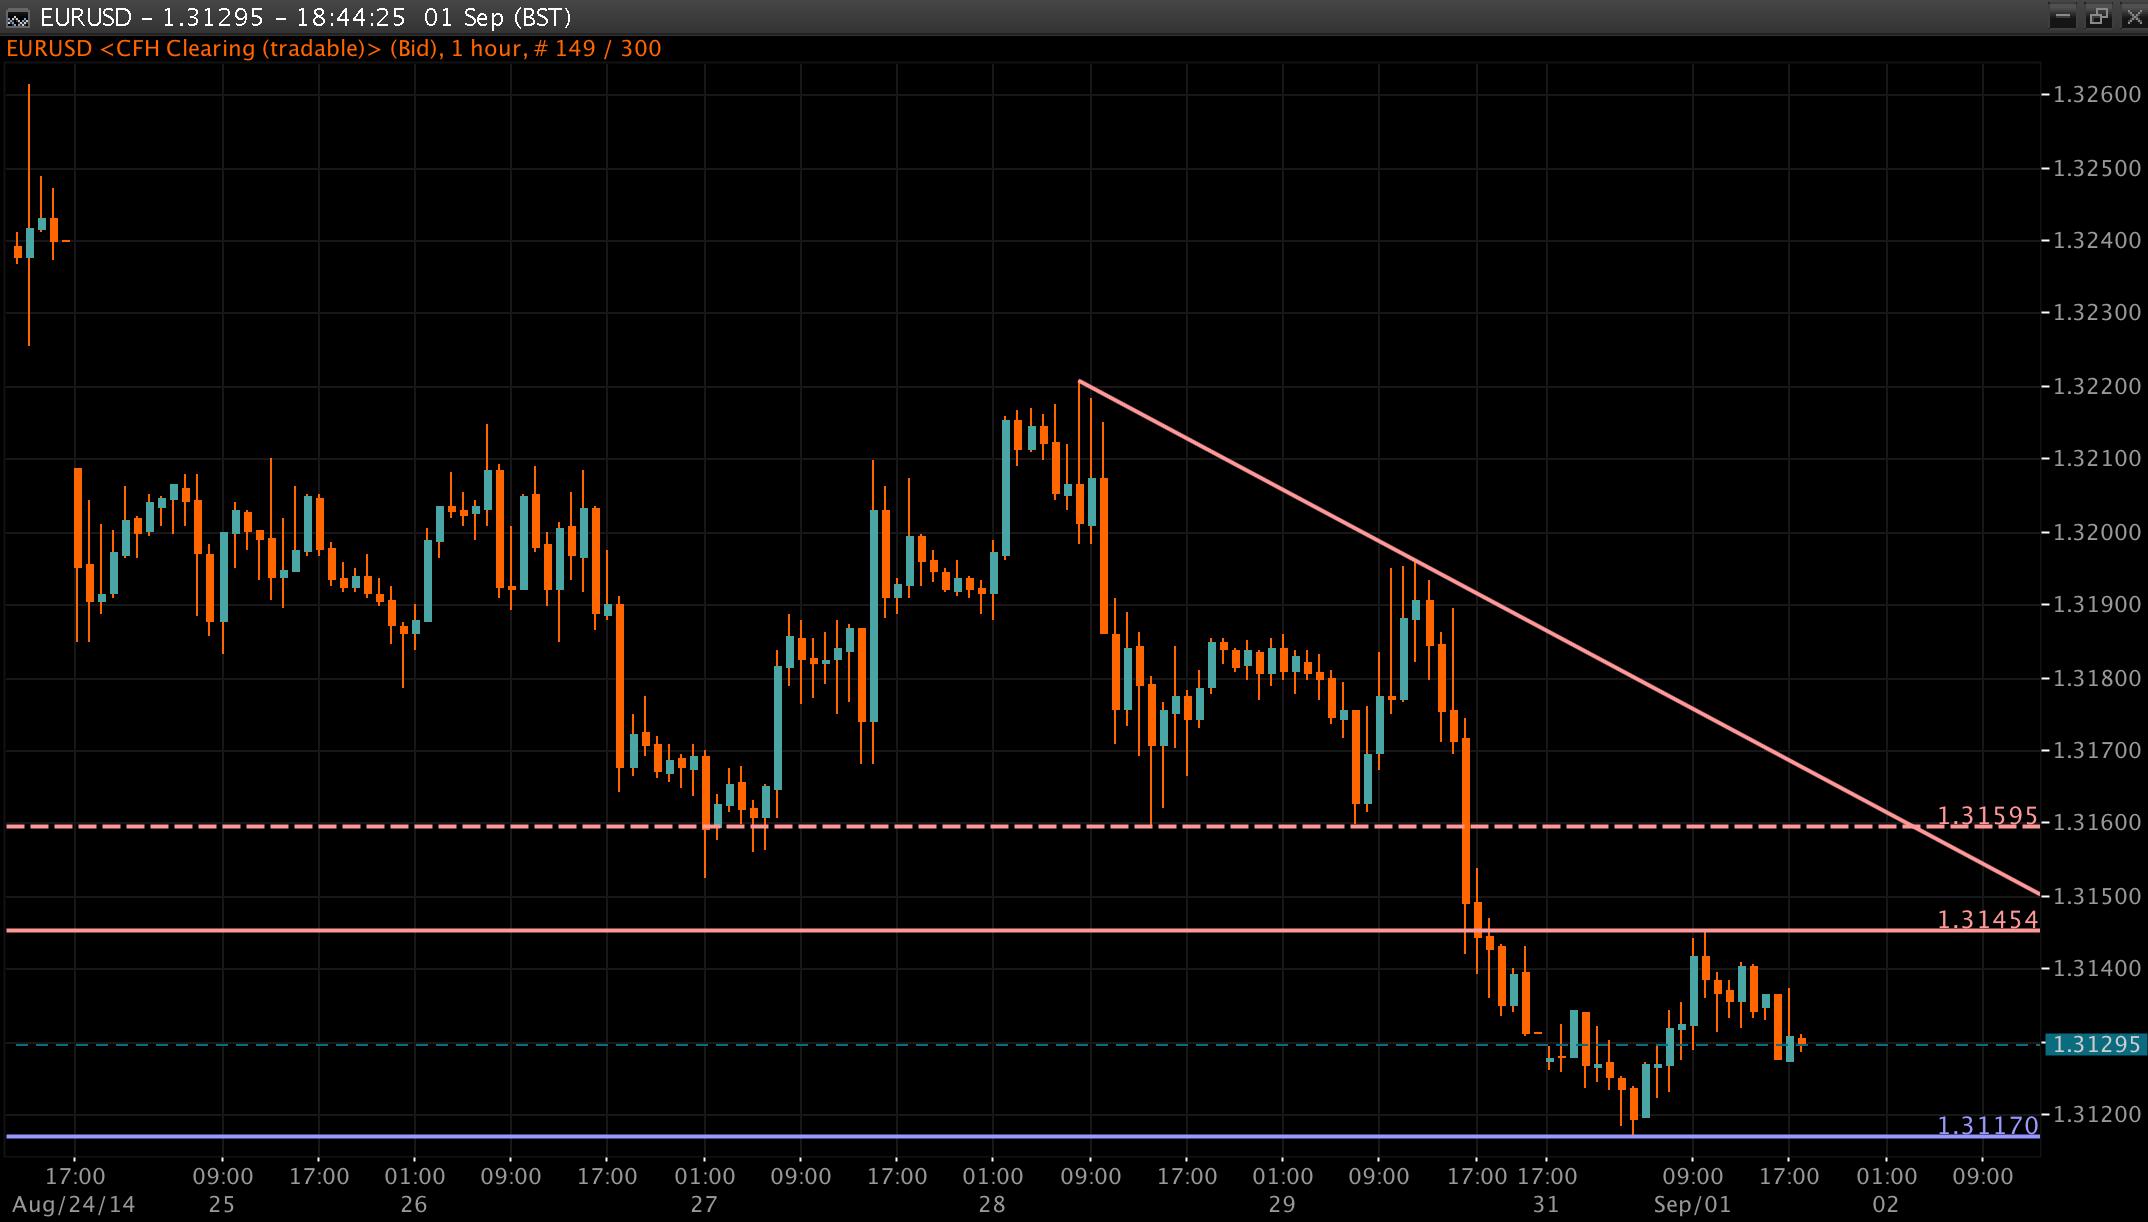 EUR/USD Chart 02 Sep 2014